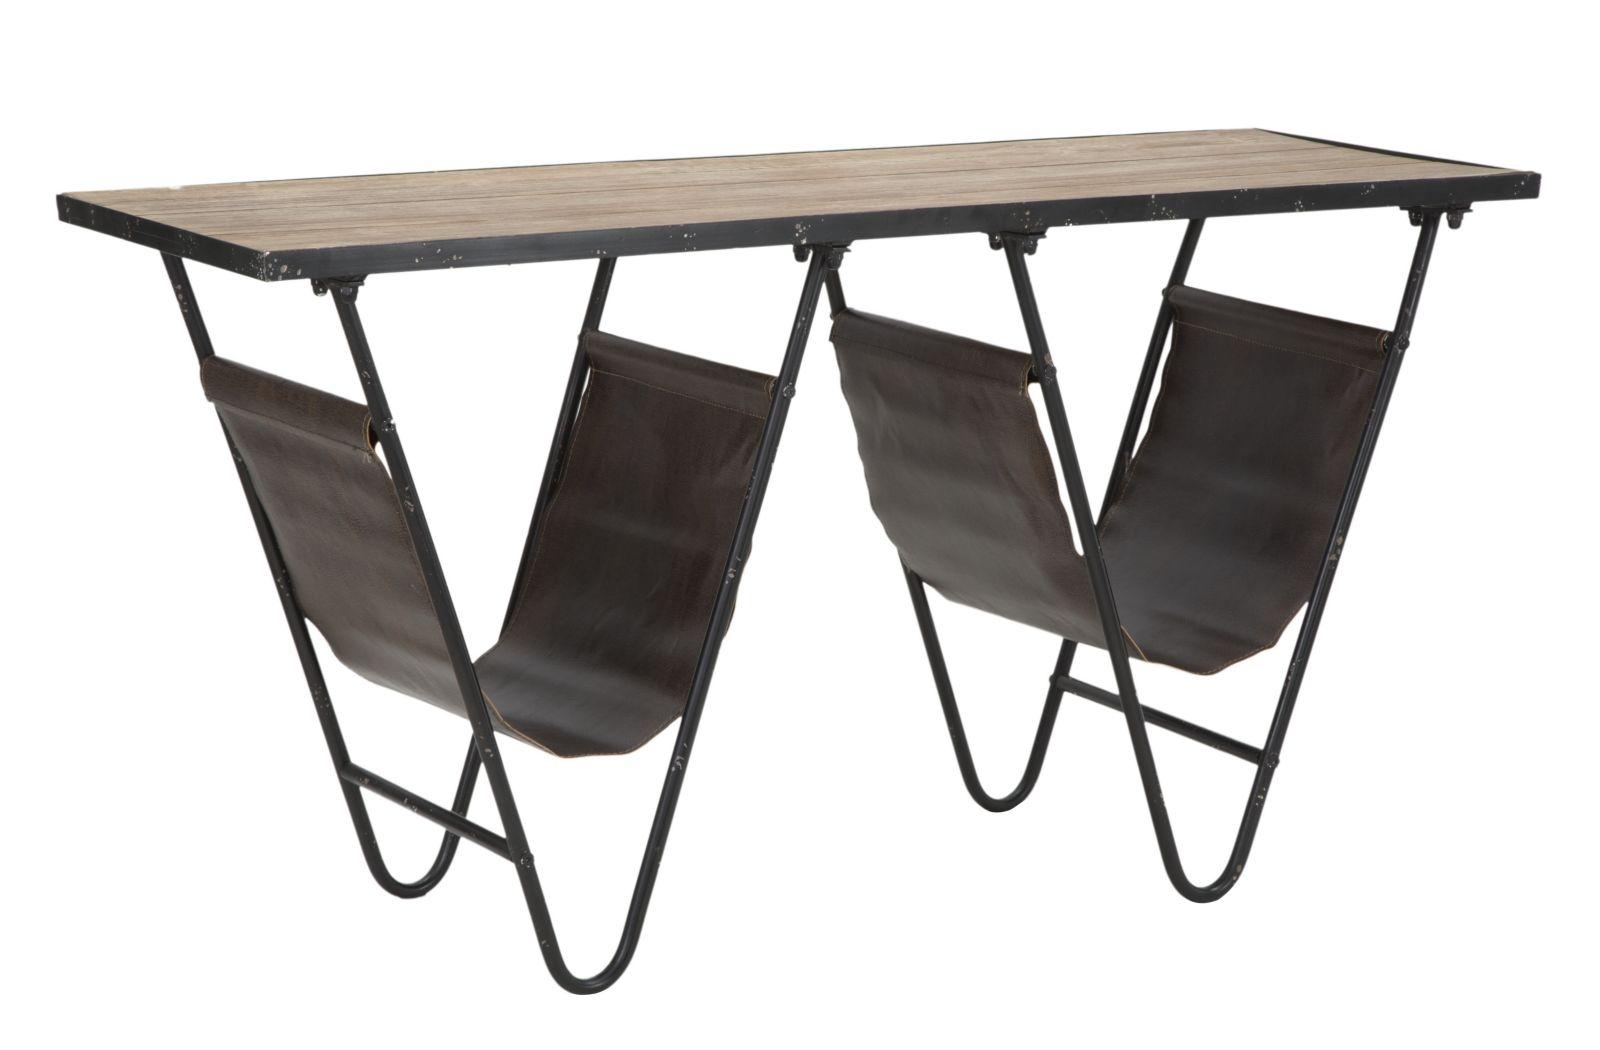 Masa din lemn de brad si metal, cu suport reviste Simply V Natural / Negru, L120xl43xH62,5 cm din categoria Mese